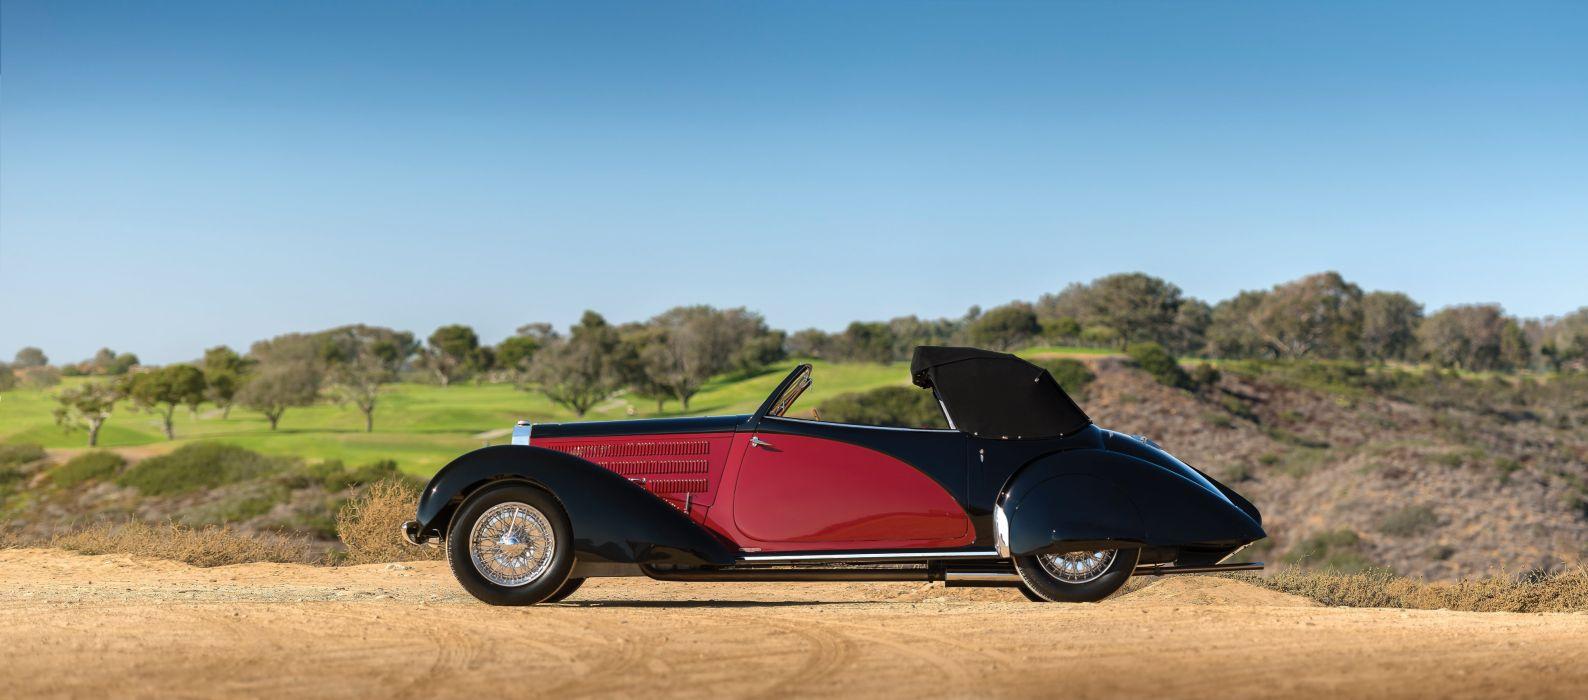 Bugatti Type 57S Drophead Coupe Letourneur Marchand cars classic 1939 wallpaper